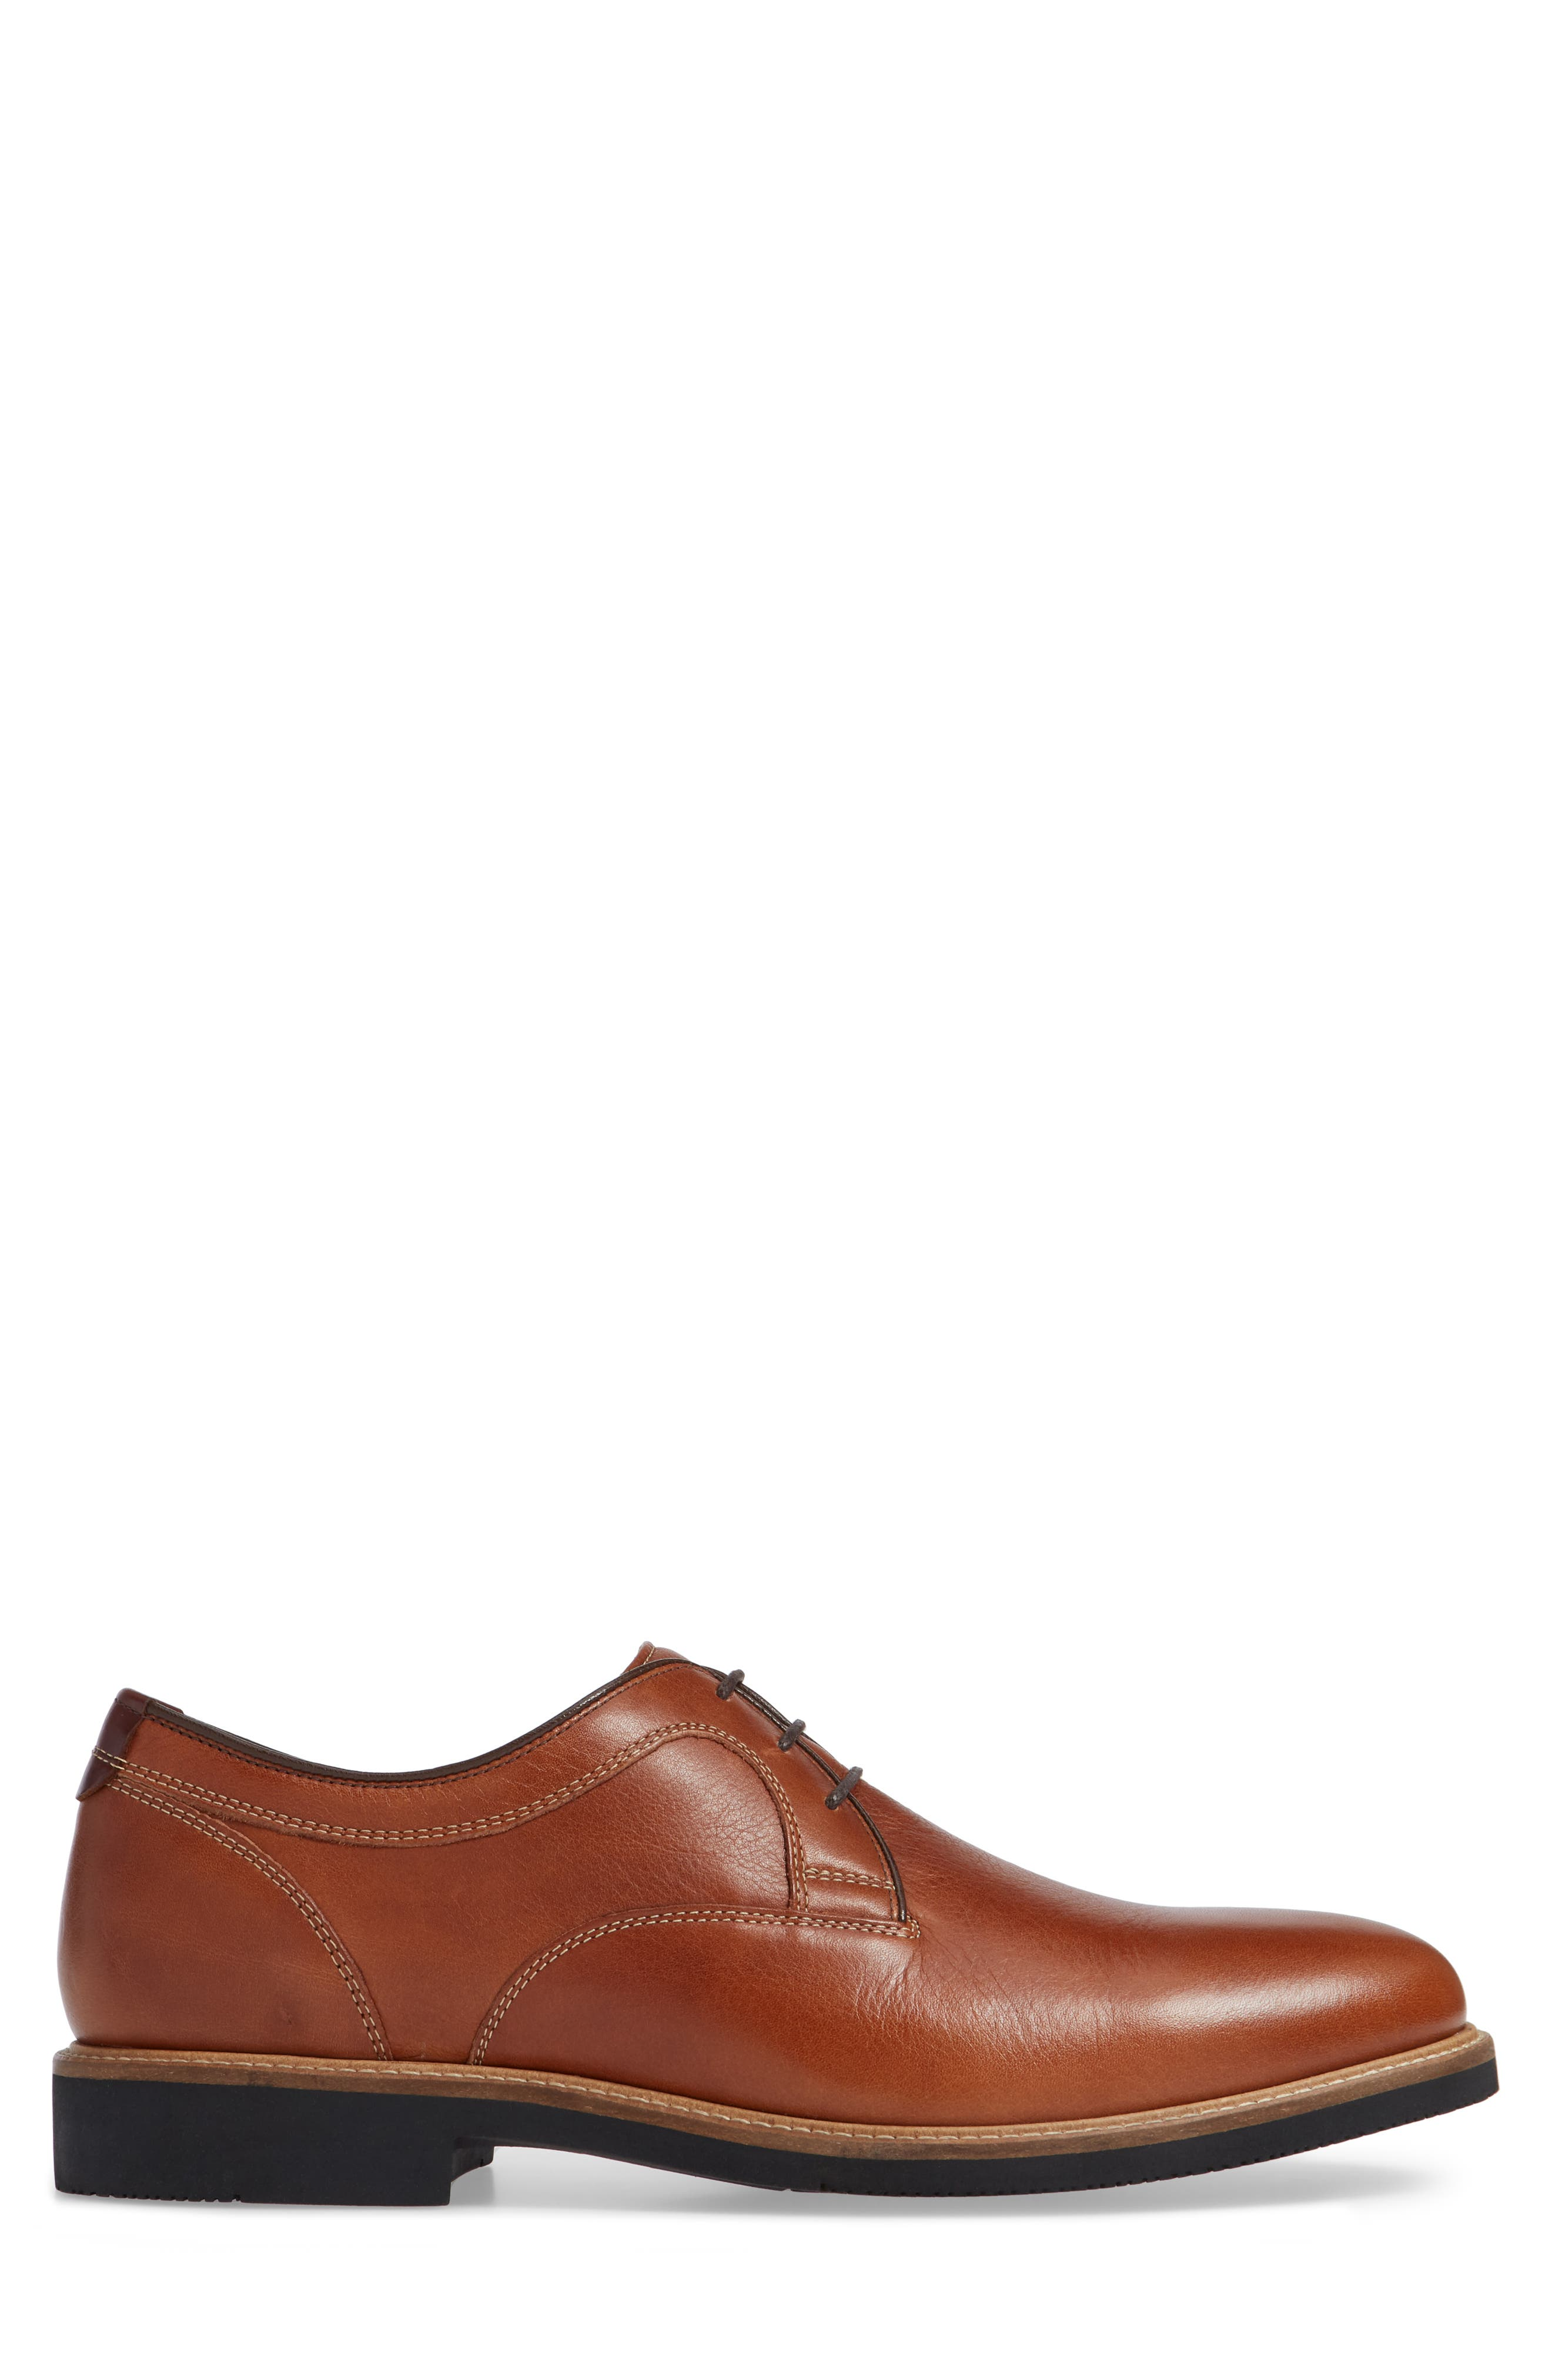 Barlow Plain Toe Derby,                             Alternate thumbnail 6, color,                             Dark Tan Leather